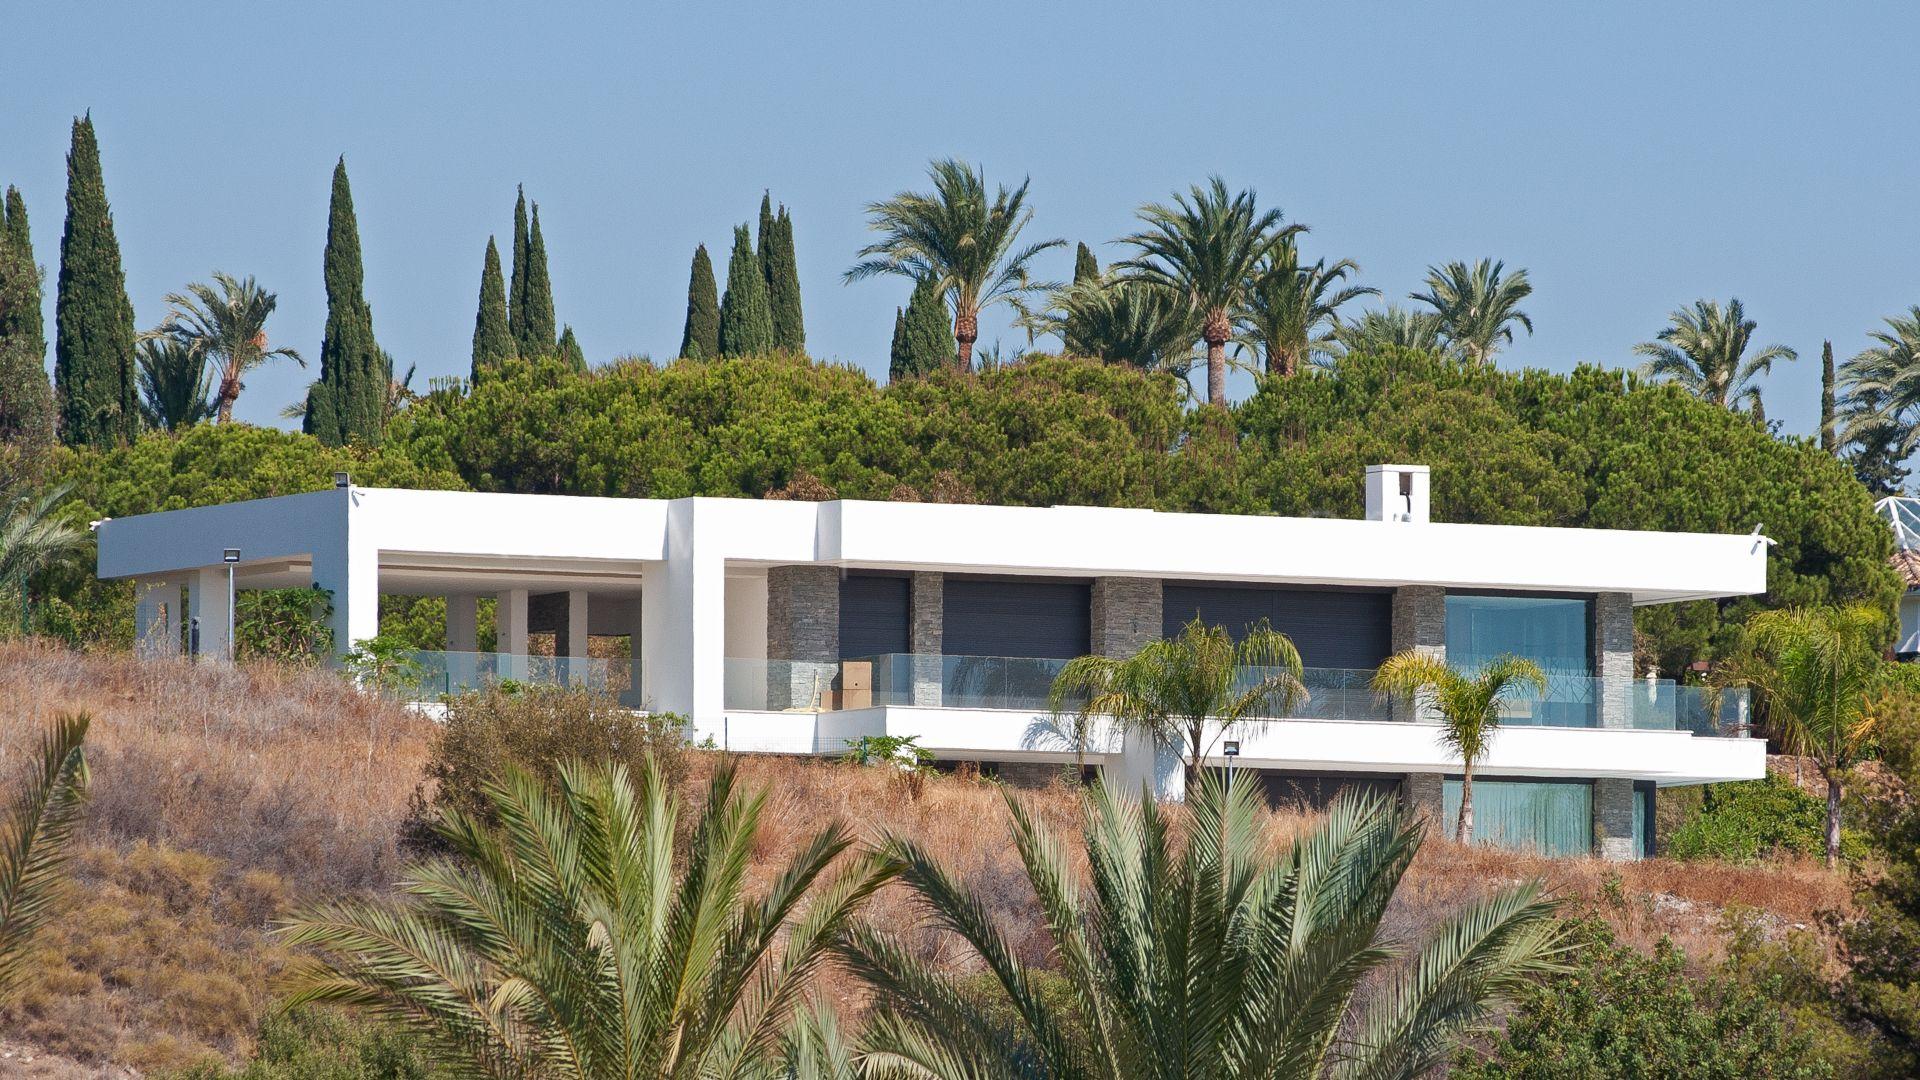 Marbella golden mile brand new modern contemporary villa - Marbella club villas ...